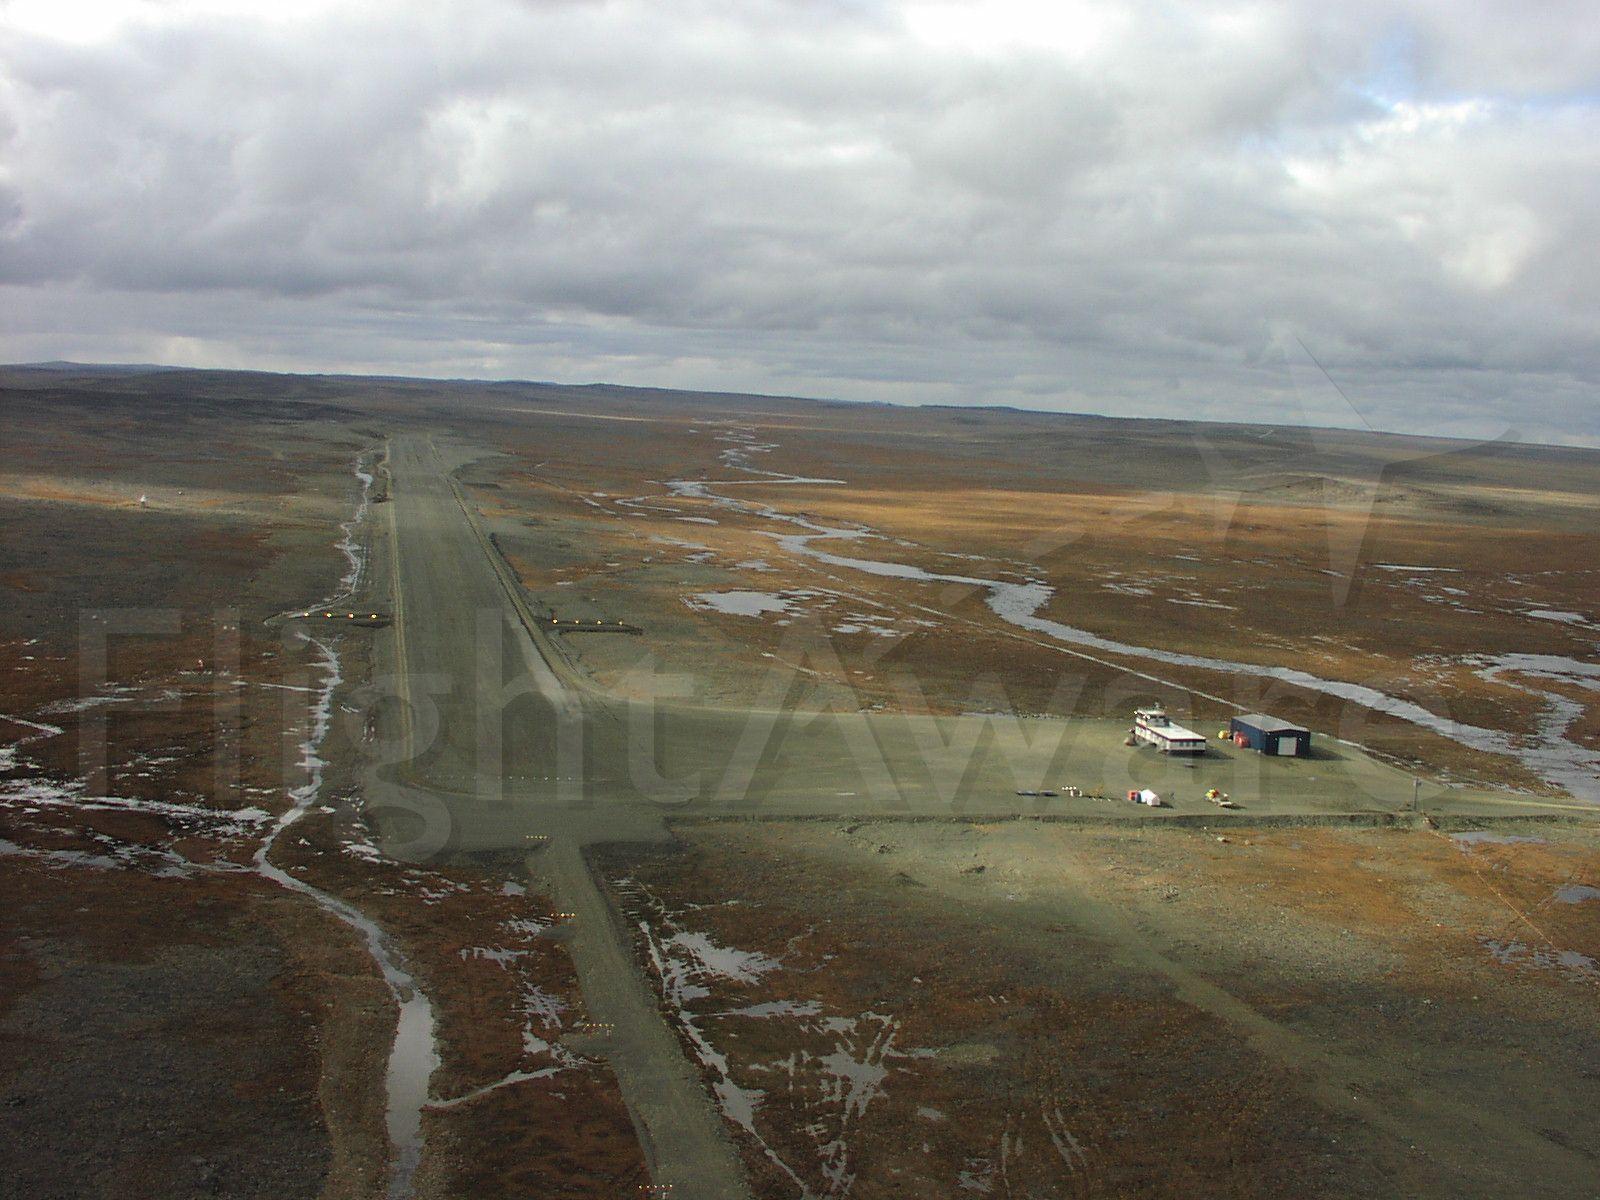 — — - Xstrata Airport Nunavik  http://gc.kls2.com/airport/CTP9